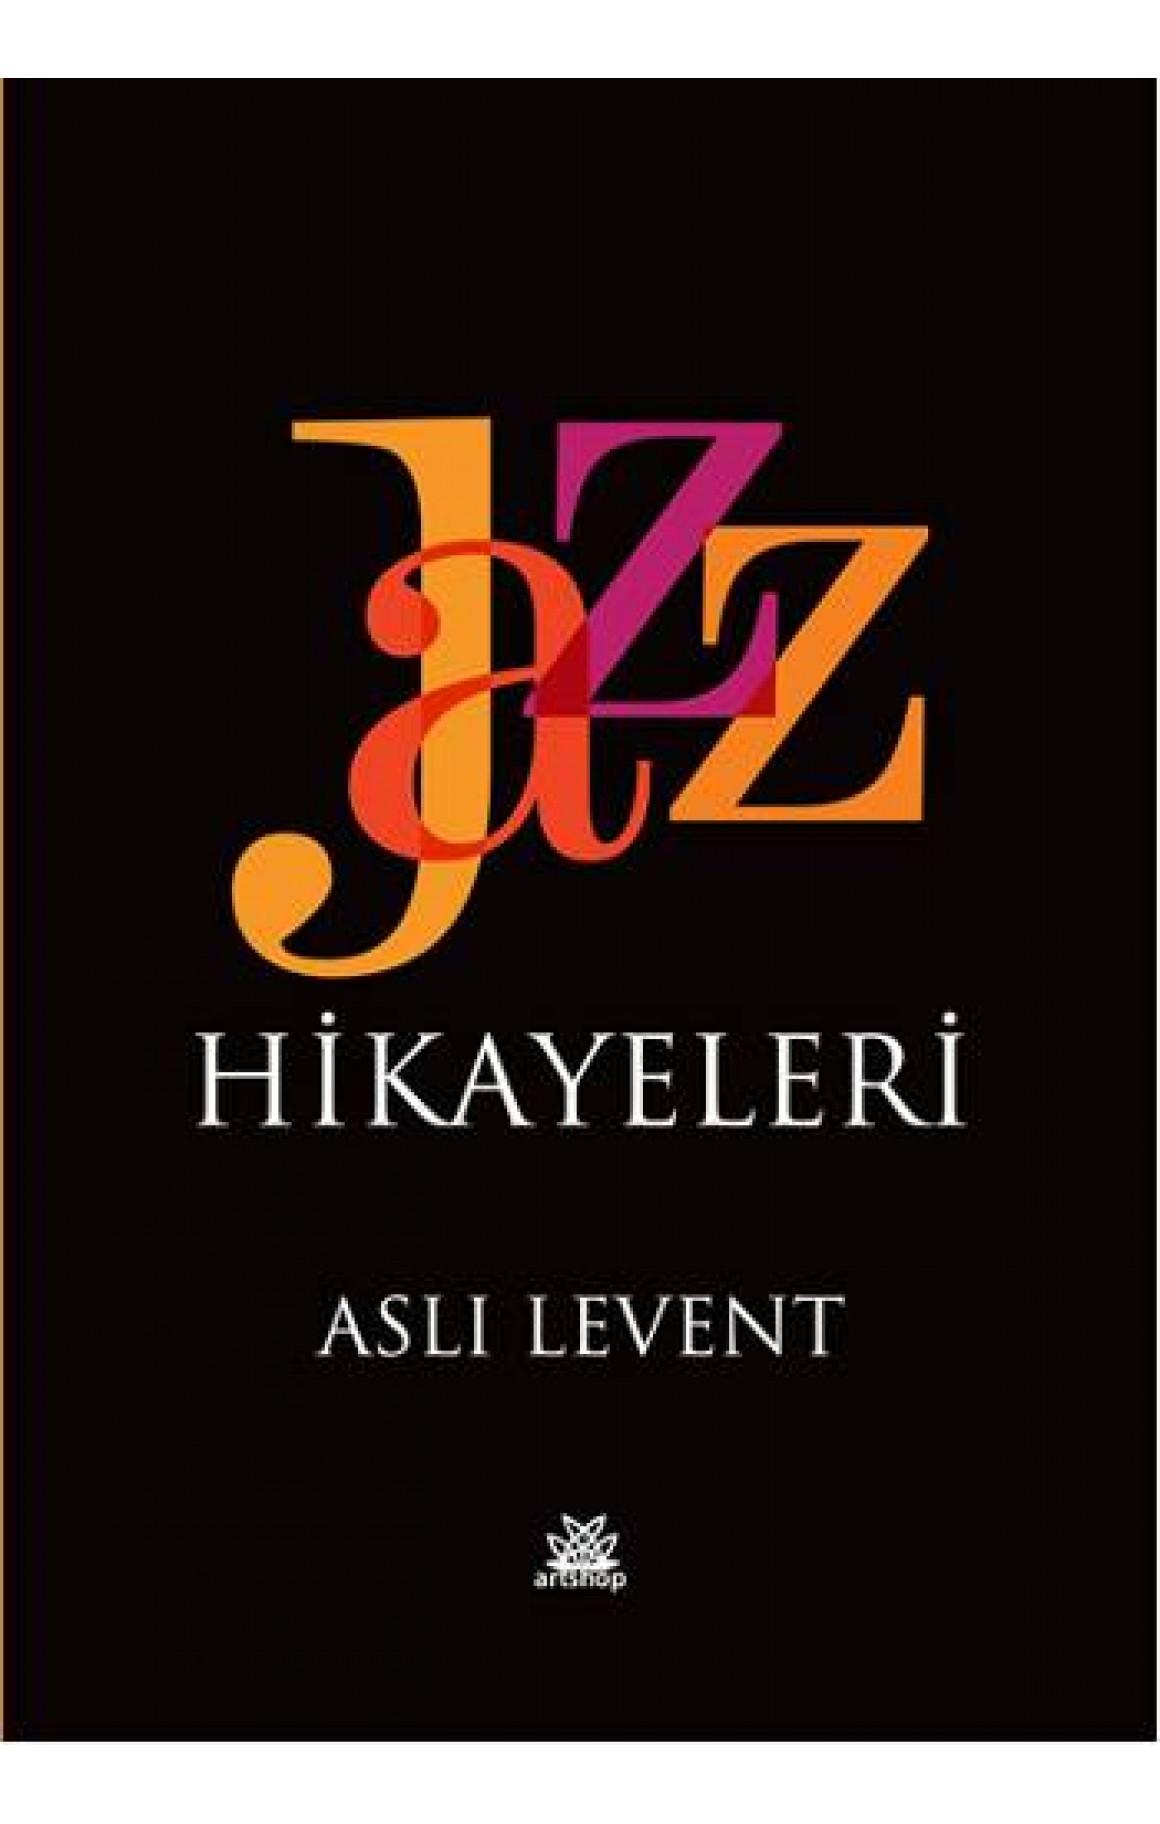 Jazz Hikayeleri